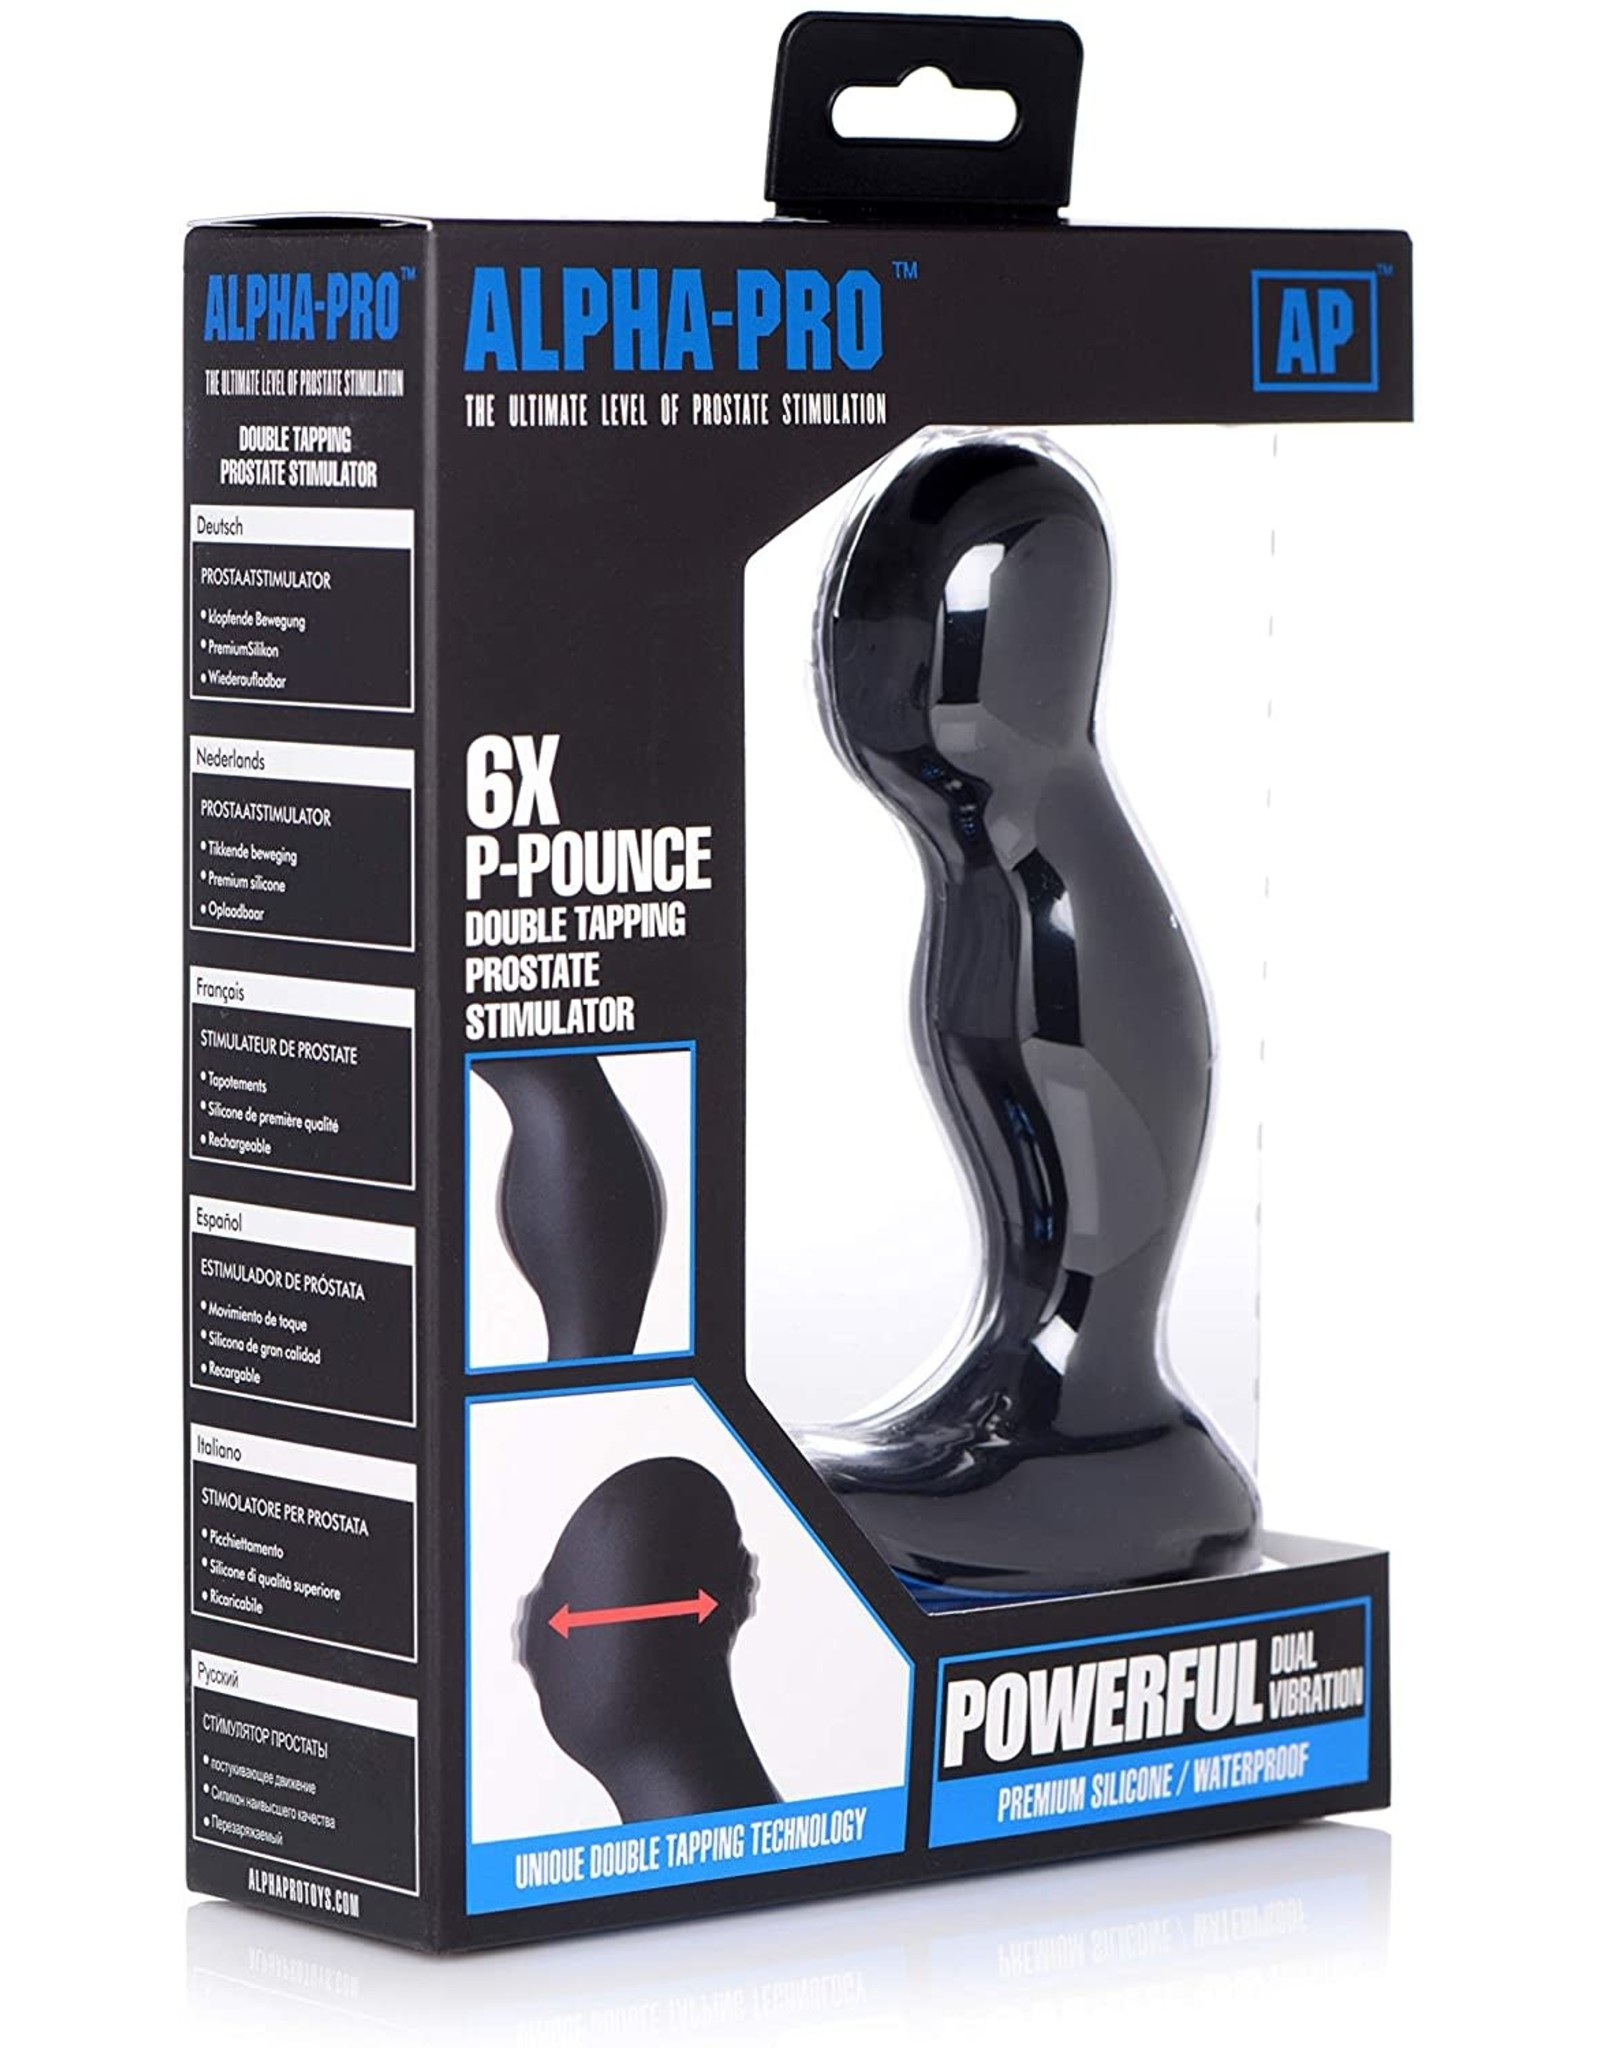 Alpha Designs Alpha-Pro 6X P-Pounce Double Tapping Prostate Stim